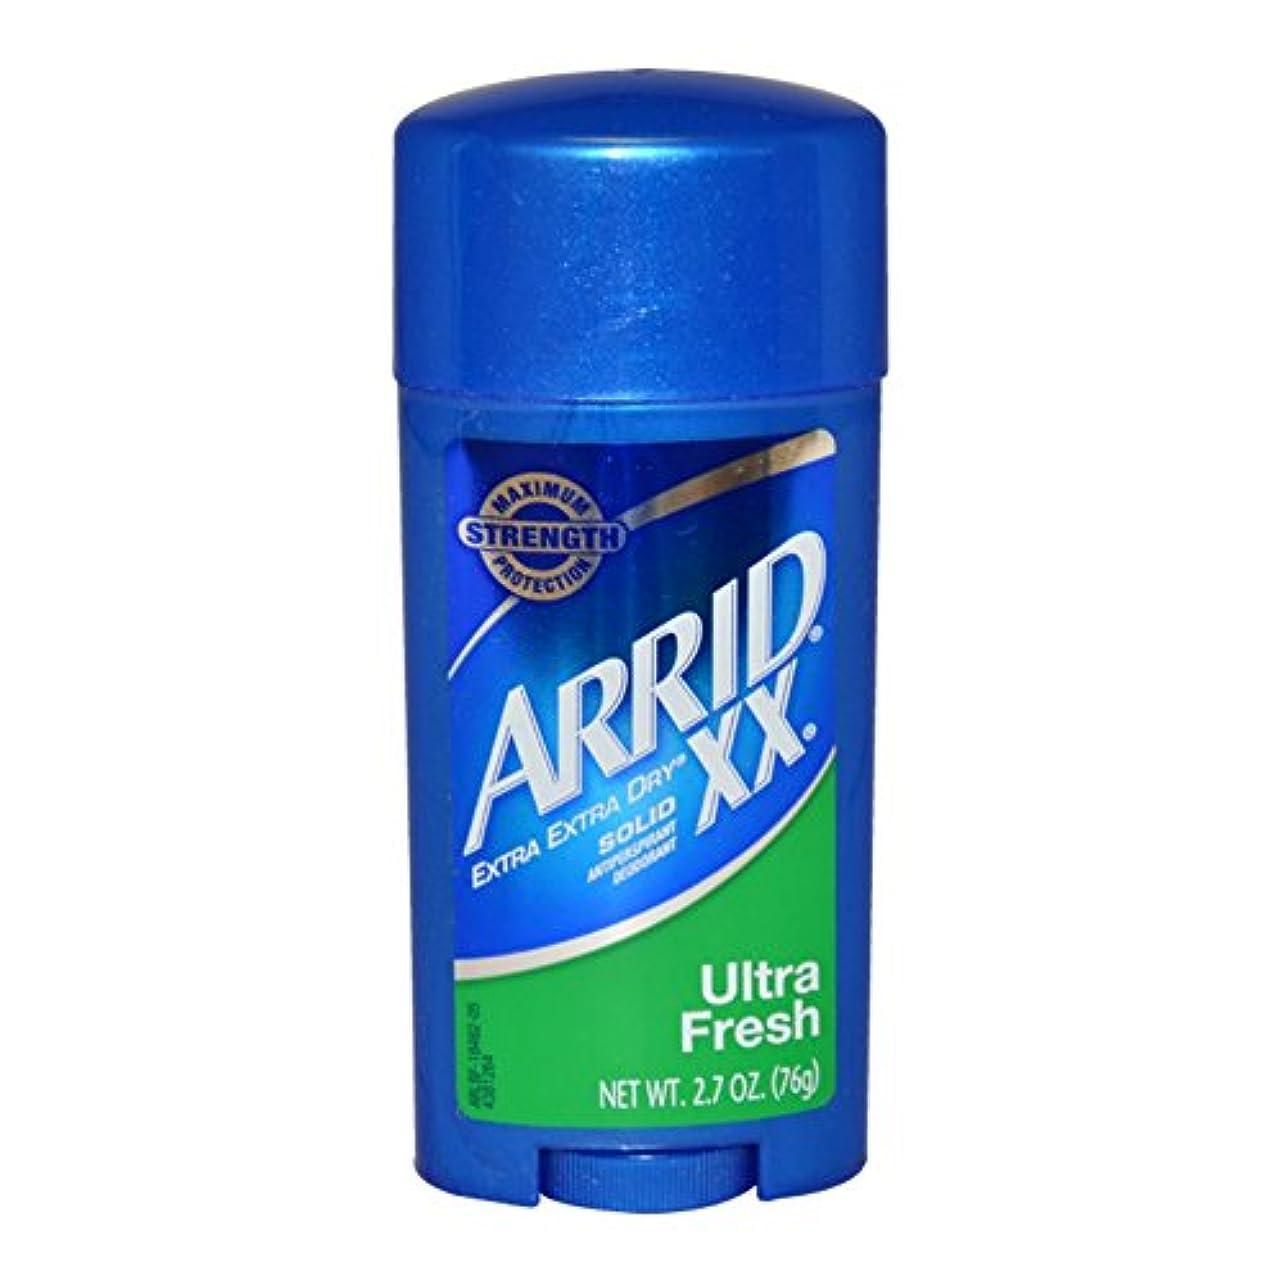 Arrid XX Antiperspirant Deodorant, Solid, Ultra Fresh - 2.7 oz (76 g) アリッド デオドラントソリッドウルトラフレッシュ [並行輸入品]